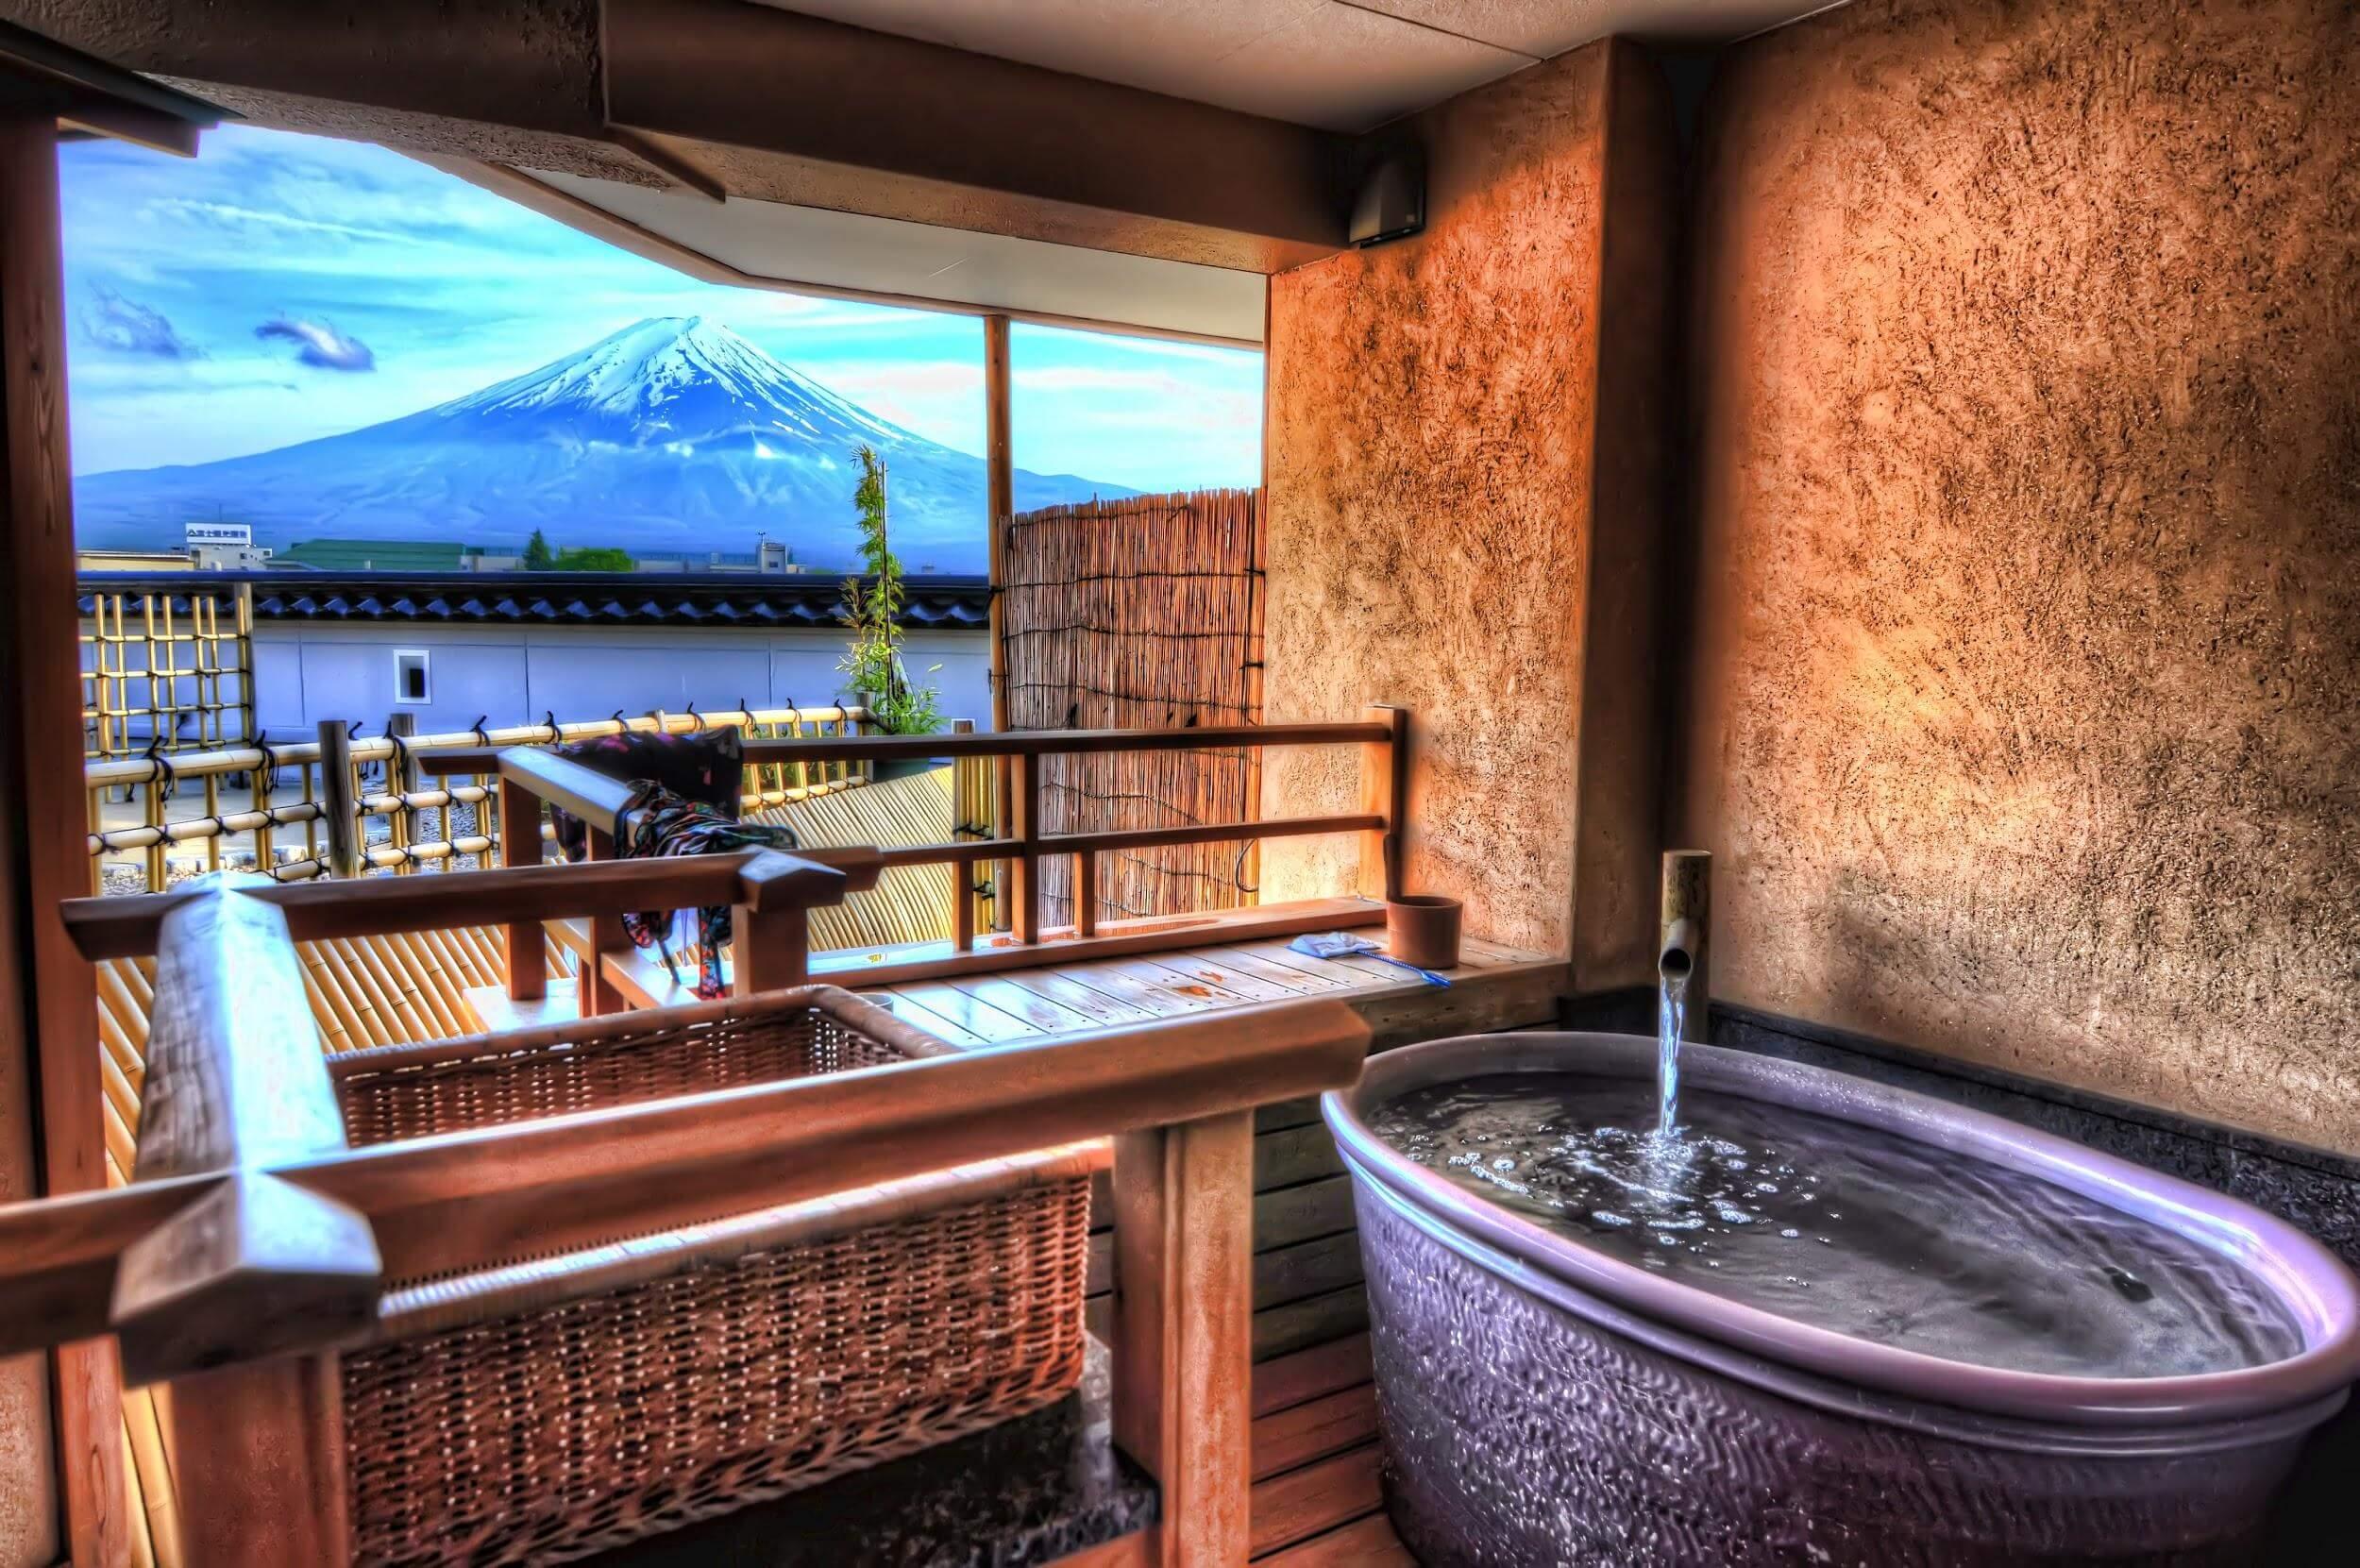 10 Best Onsen Towns in Japan